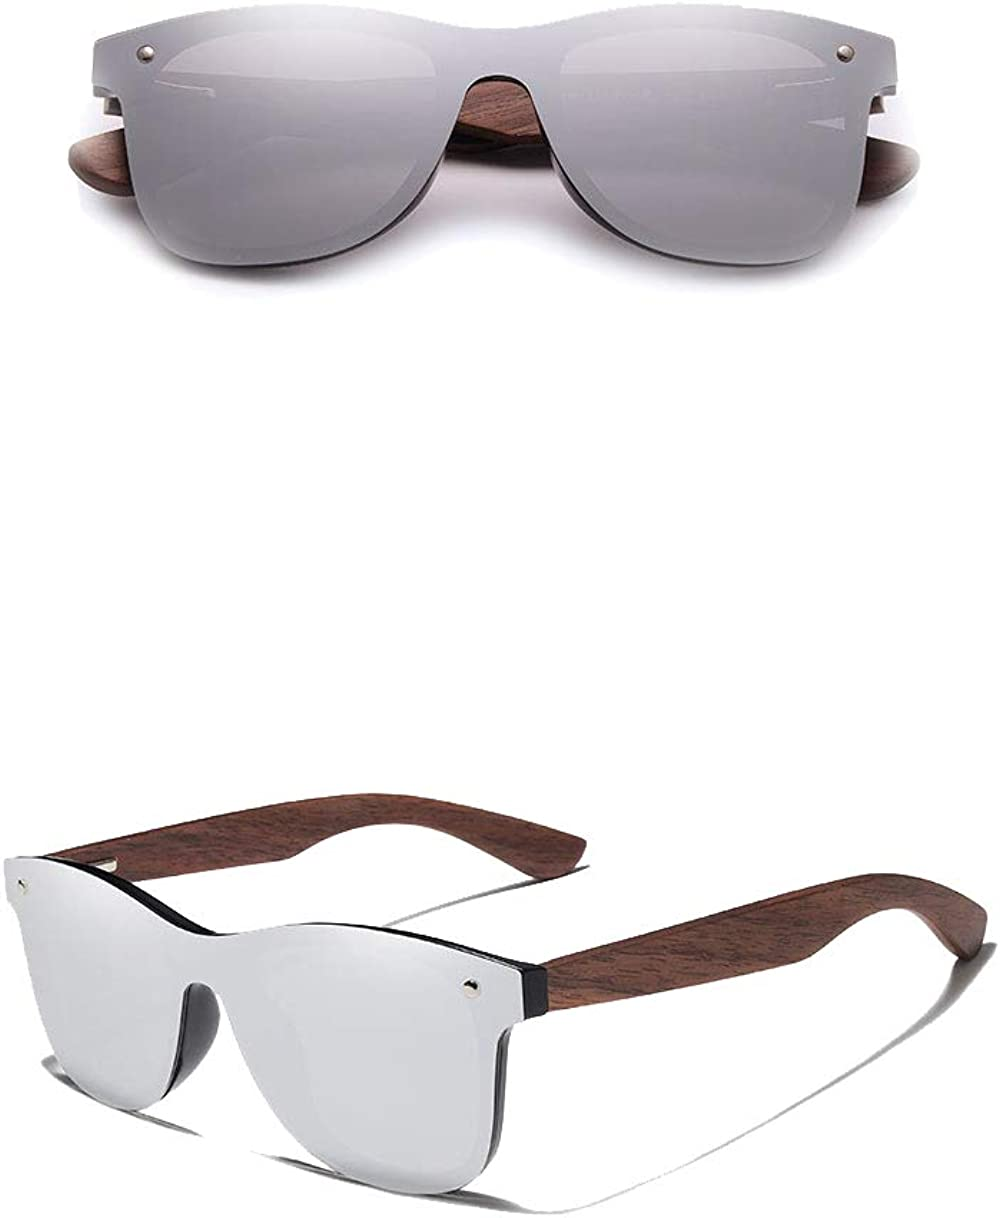 Genuine Kingseven Some reservation adjustable polarized squar handmade sunglasses Max 58% OFF